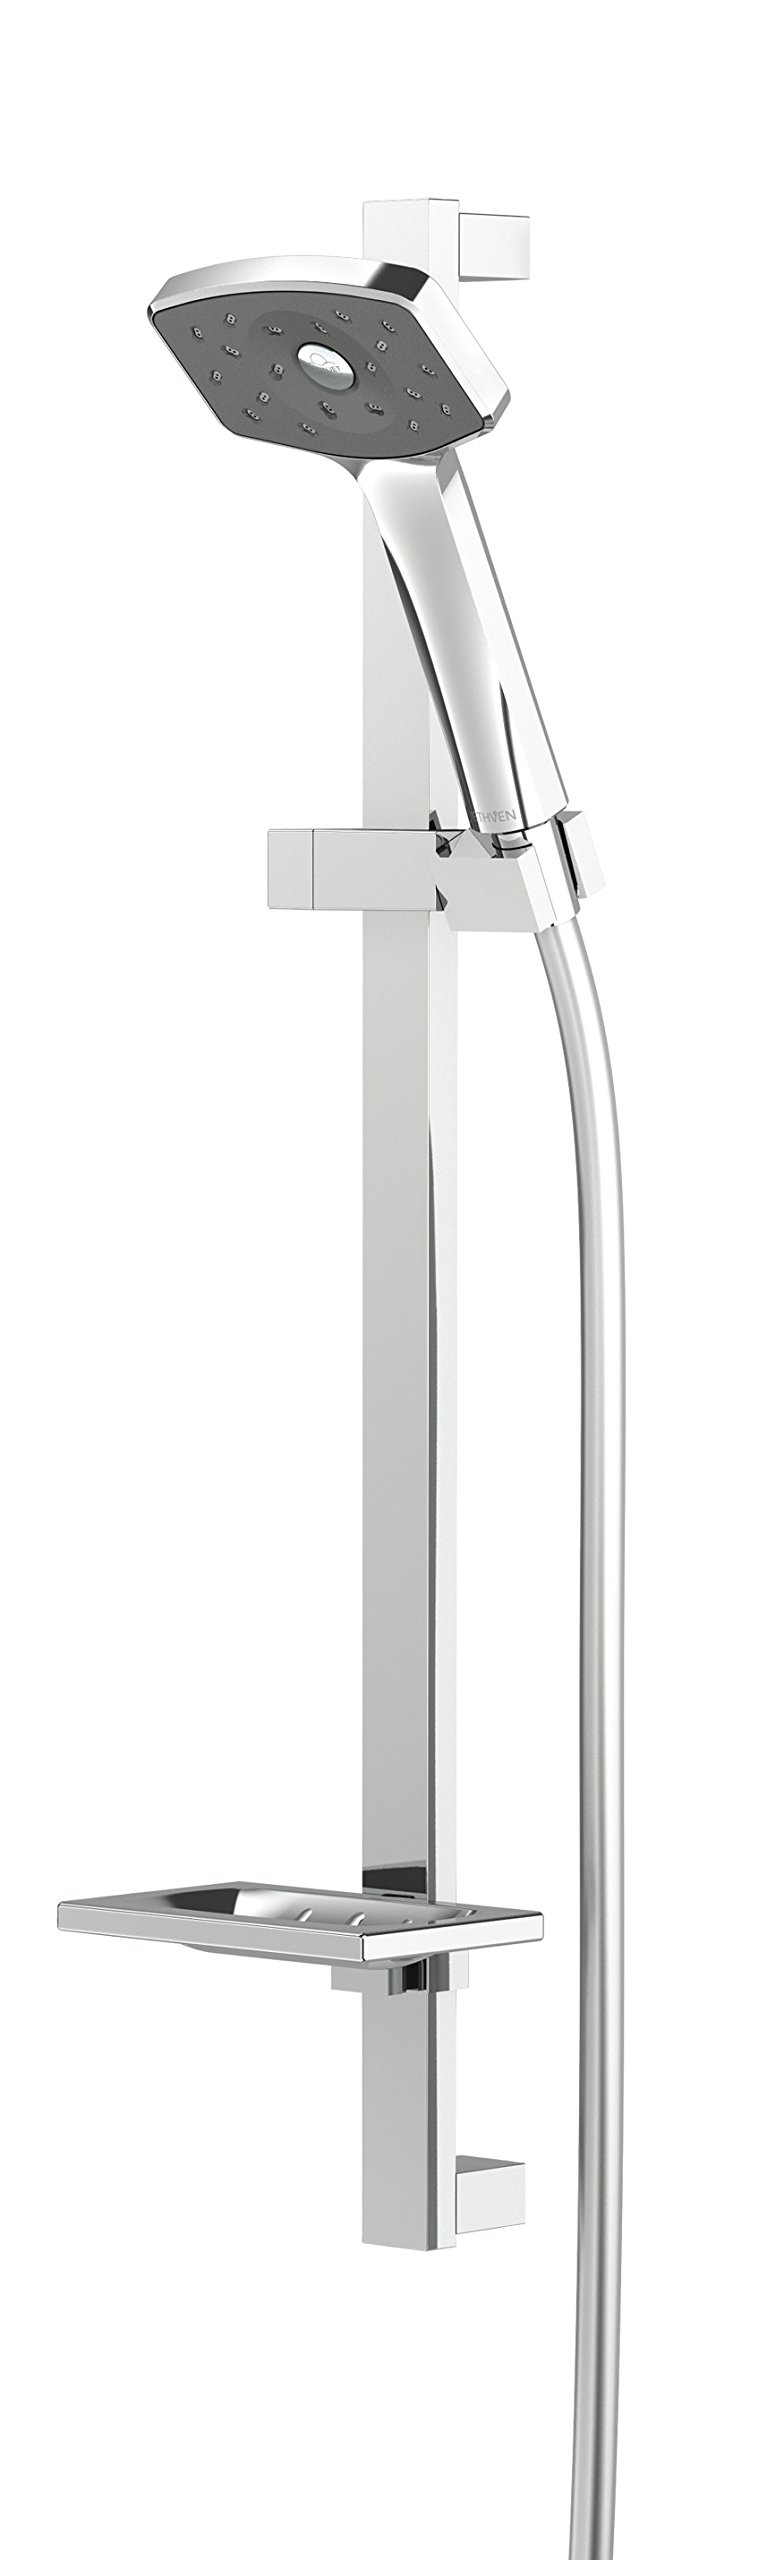 Methven Waipori Modern Bathroom Slide Bar Wall Mount Handheld Shower Head Revolutionary Experience with Satinjet Patented Technology